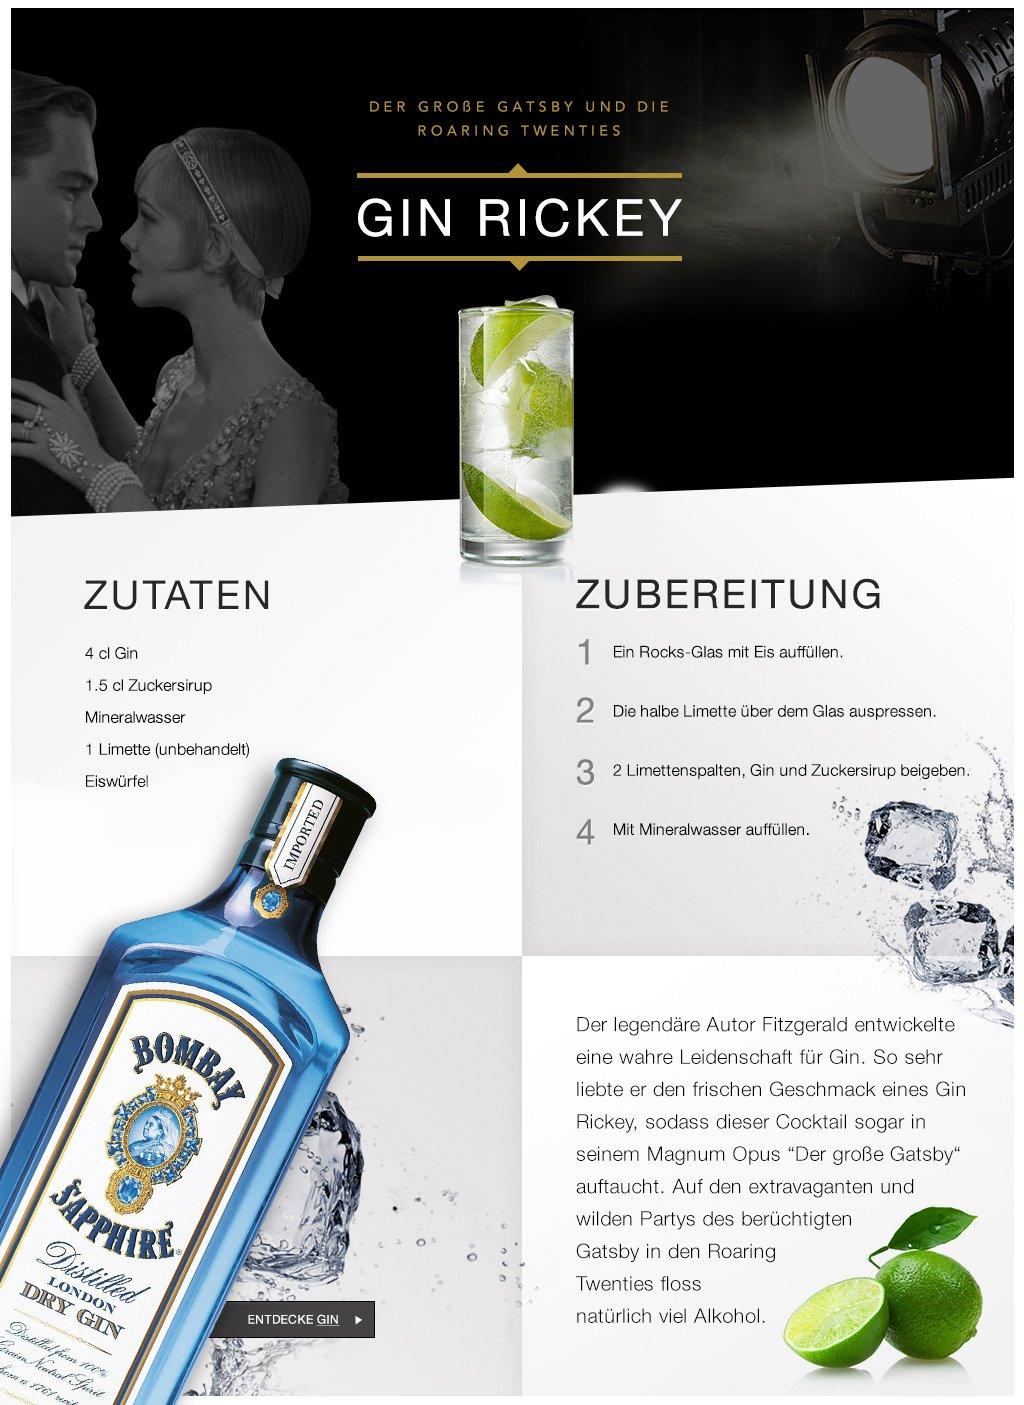 Amazon.de: Der große Gatsby: Gin Rickey: Lebensmittel & Getränke